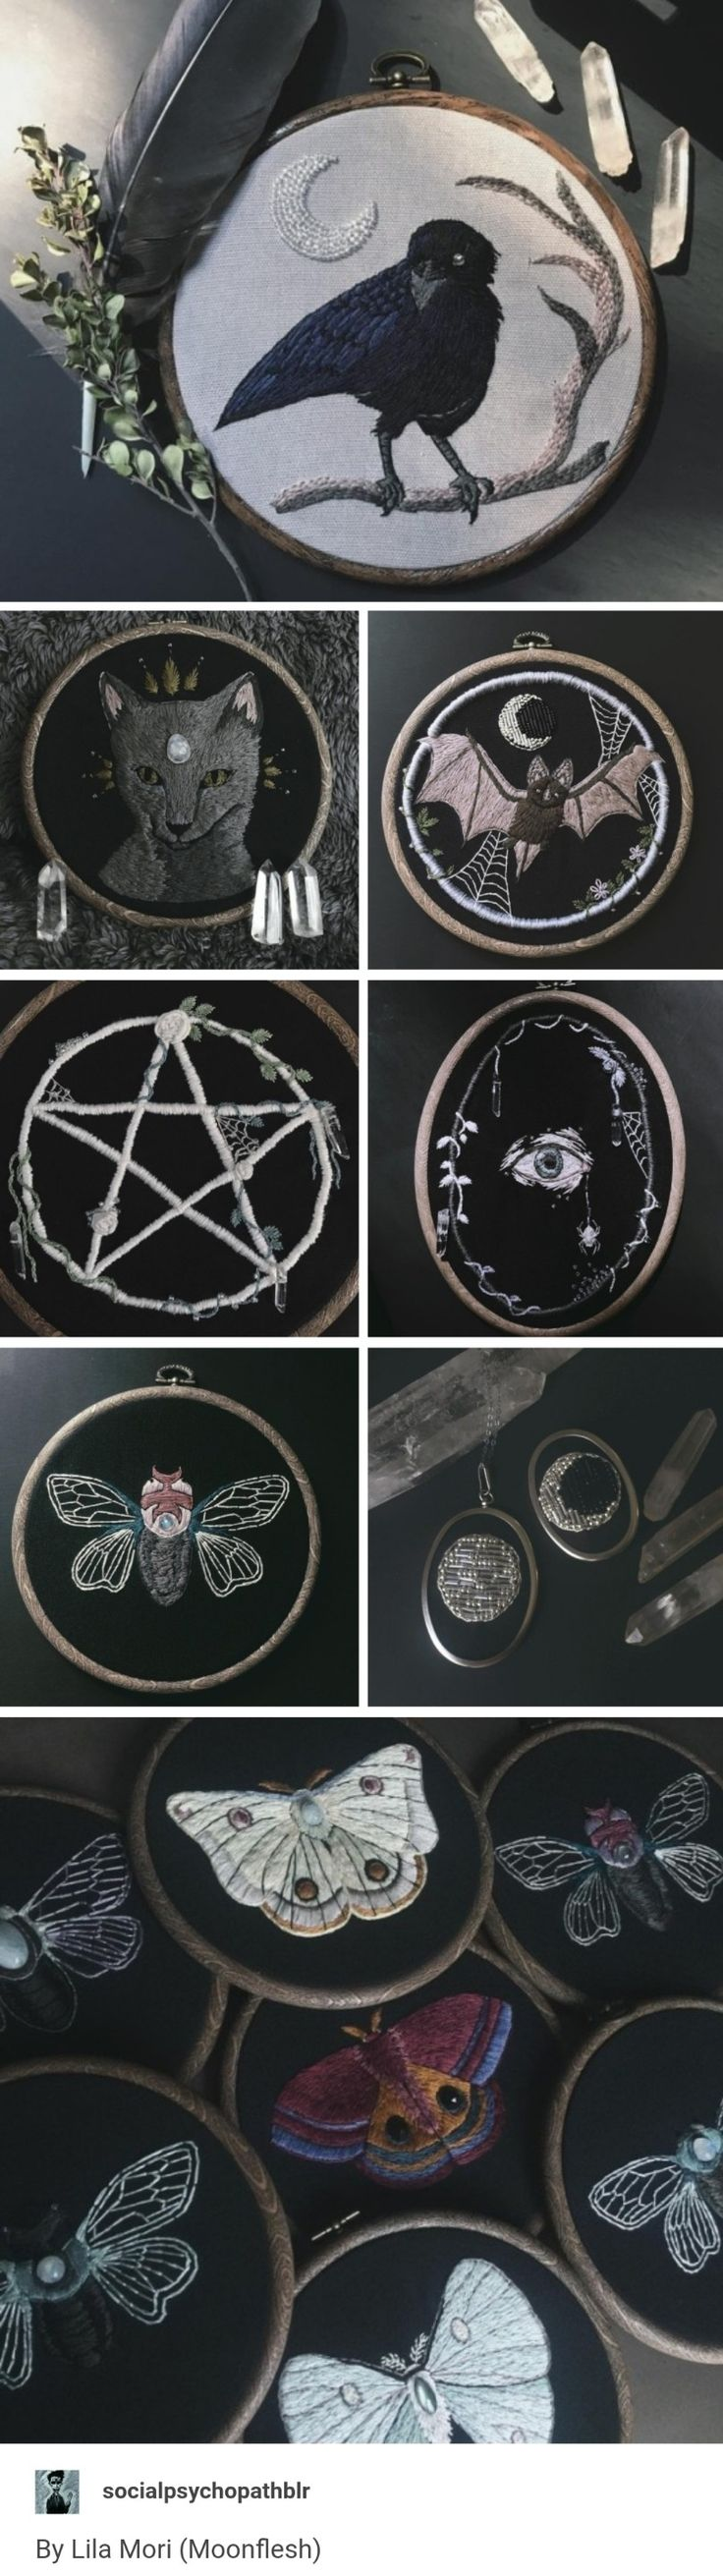 lyla mori (@moonflesh) dark embroidery with moths and ravens #handembroidery #embroideryartist Giulette Neferu